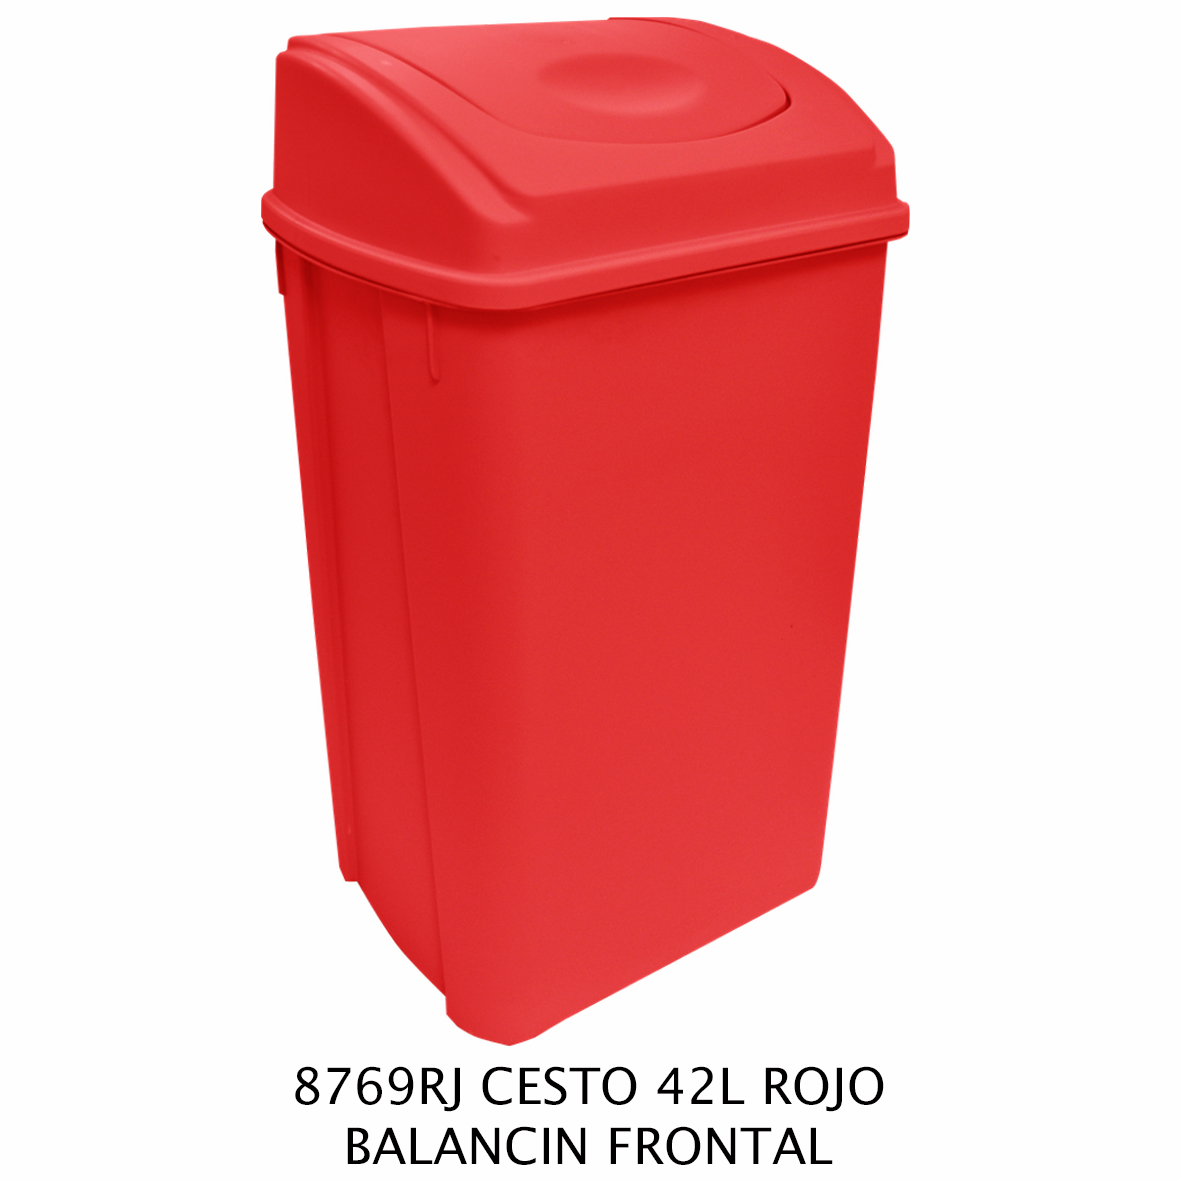 Bote de basura de 42 litros con balancín frontal color rojo modelo 8769RJ de Sablón